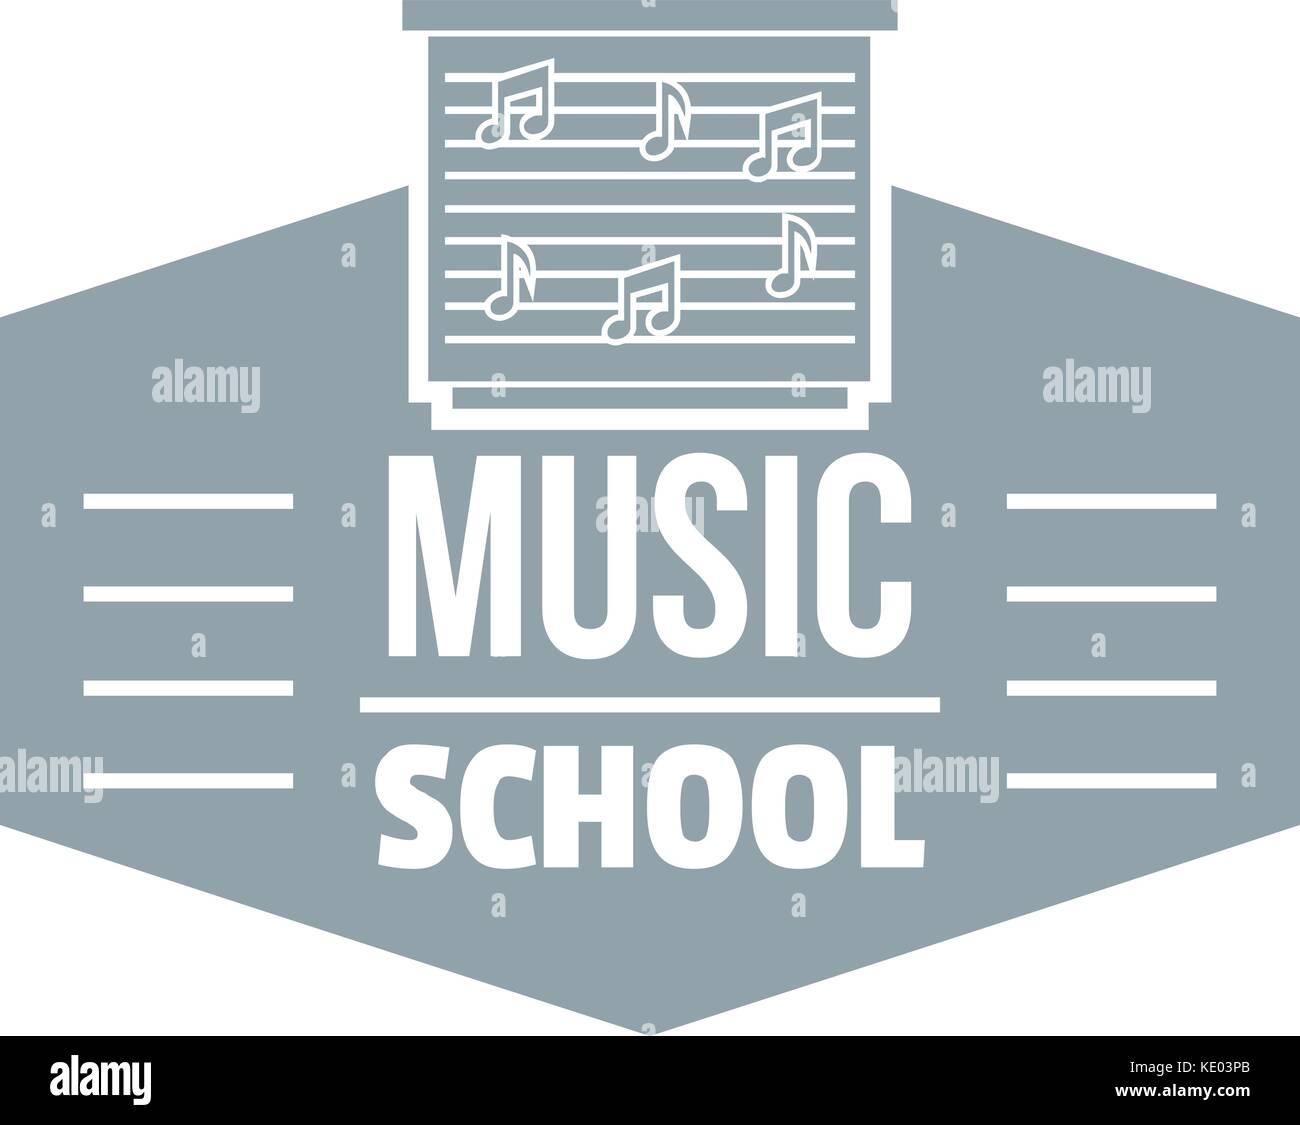 Music school logo, simple gray style - Stock Image